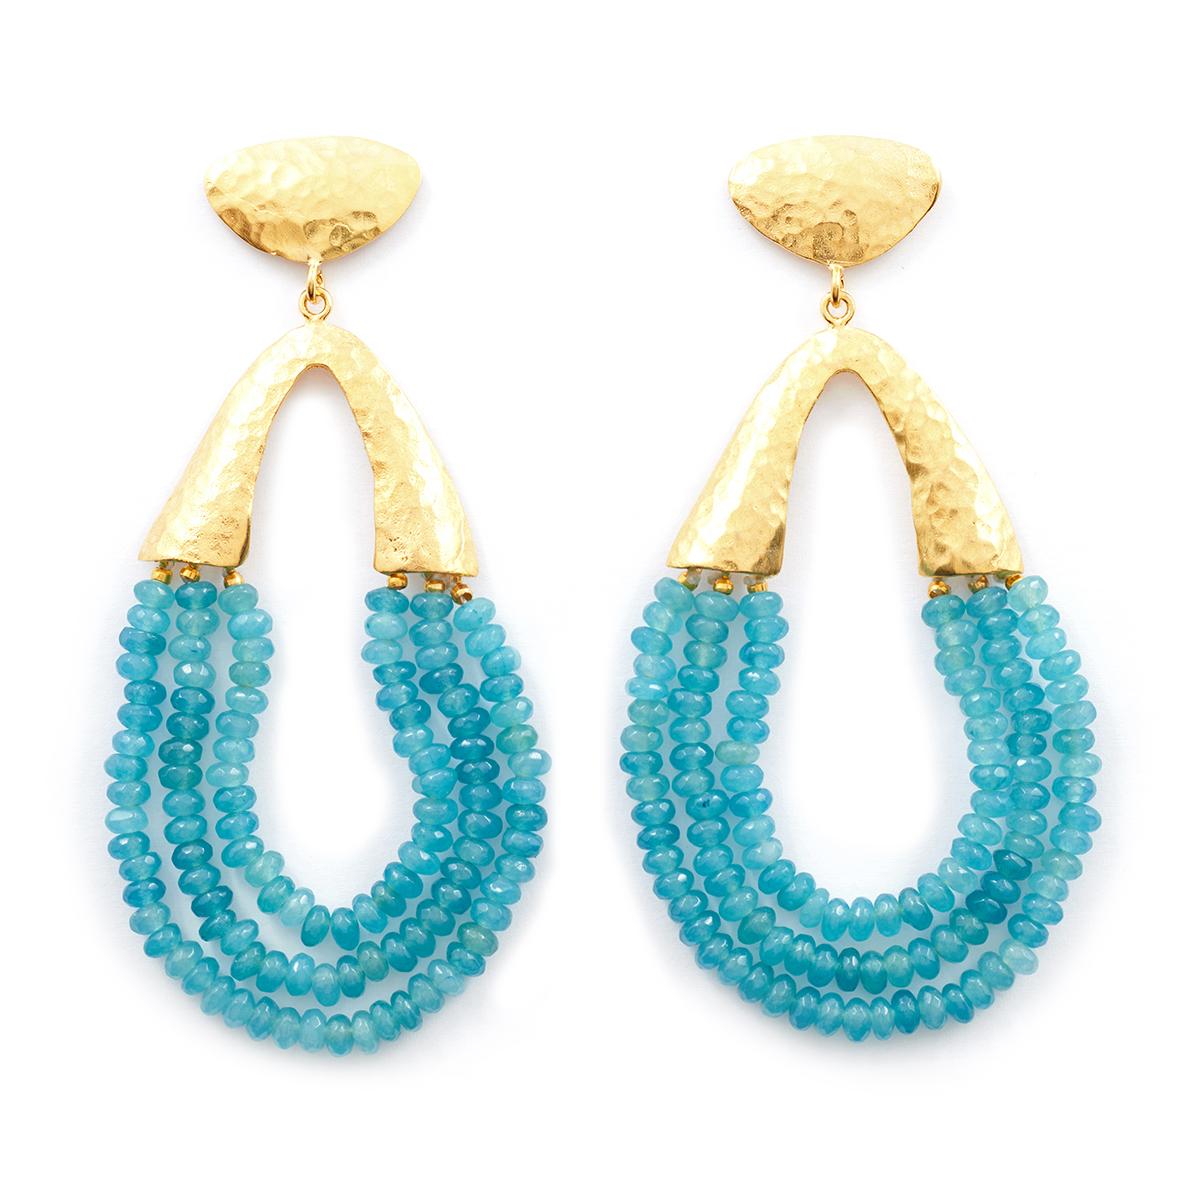 Beaded aqua earrings by Ottoman Hands